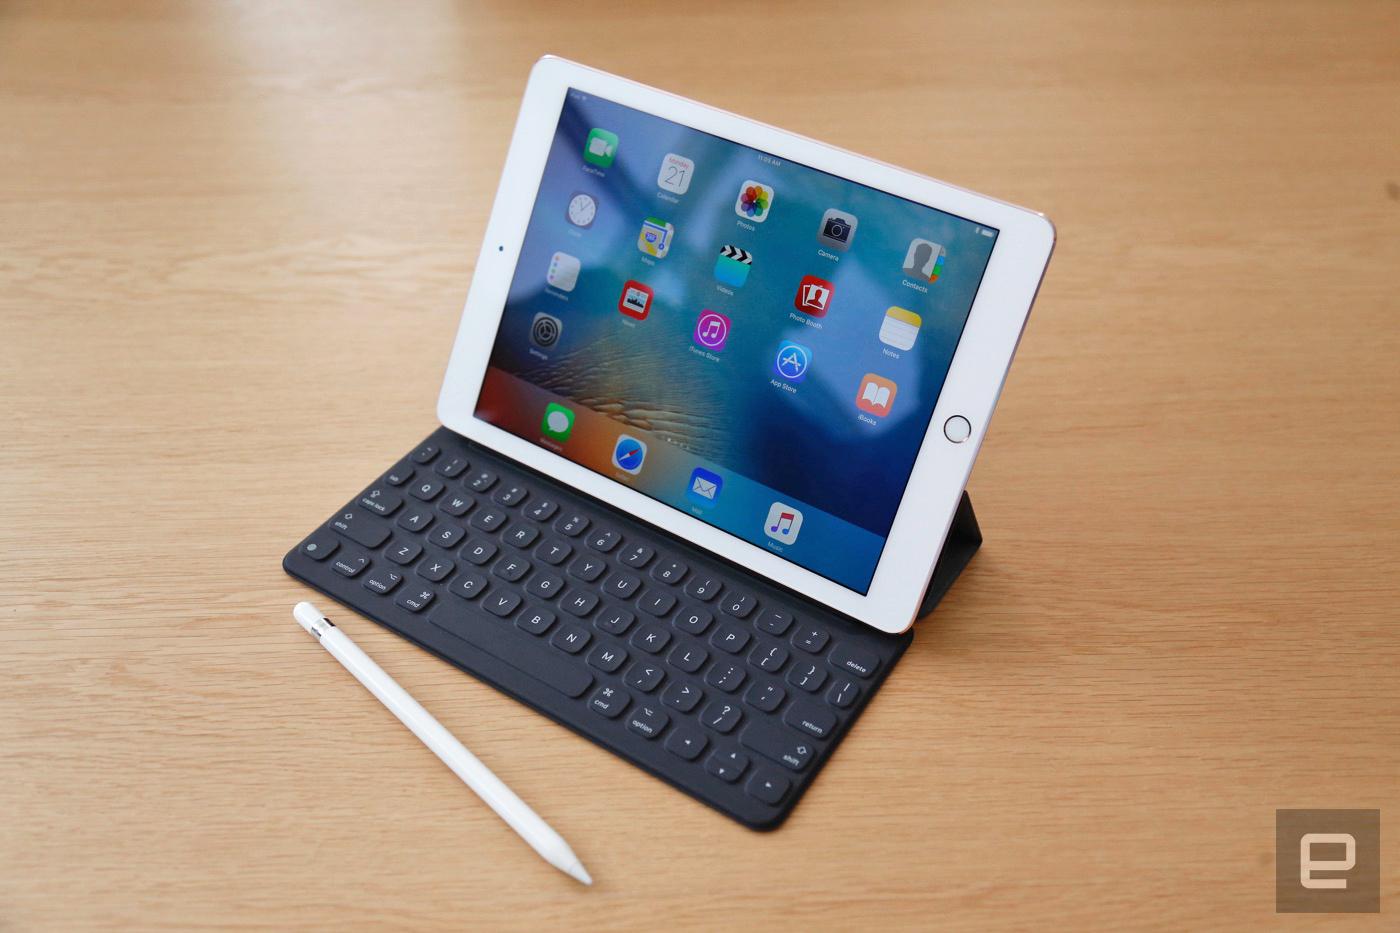 iPad Pro (9,7 Zoll): True Tone Display, A9X, 12 MP-Kamera und auch in Rosengold (UPDATE x2: Hands-On)